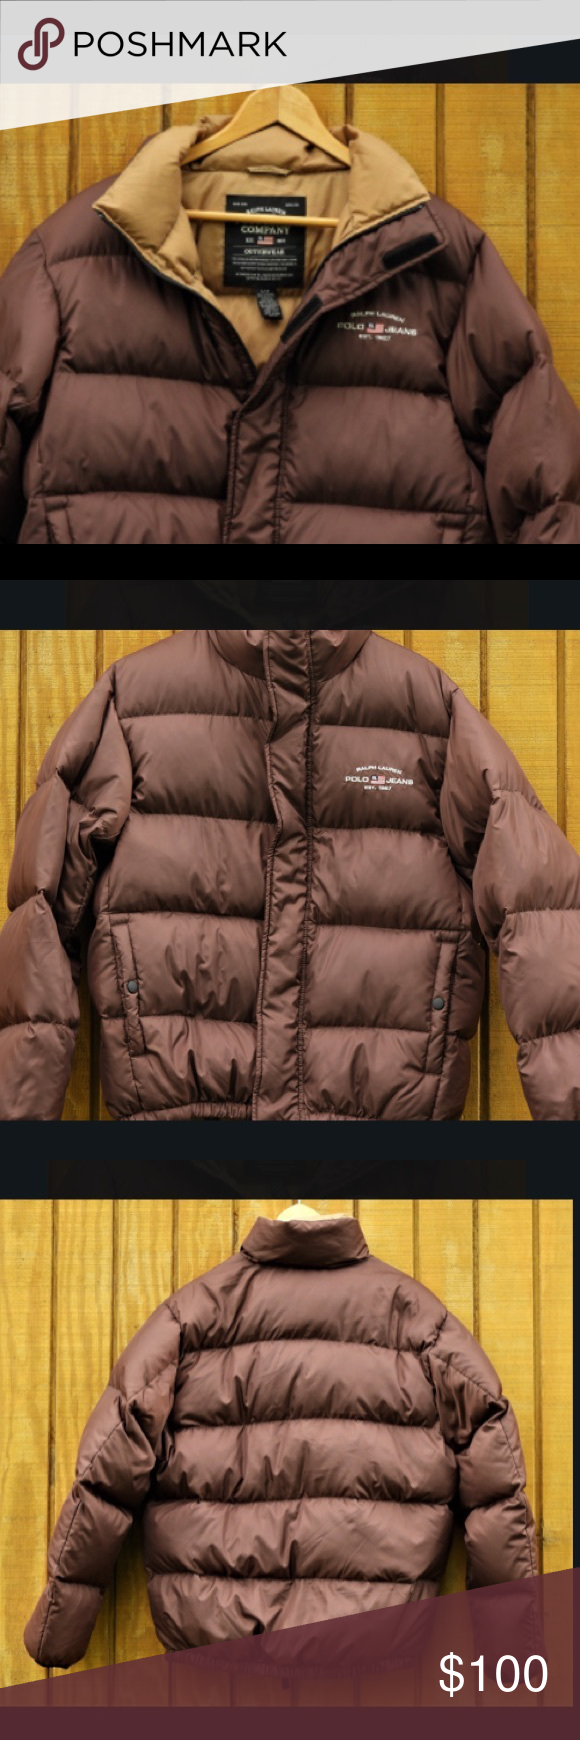 Vintage Ralph Lauren Polo Puffer Jacket Jackets Polo Ralph Lauren Ralph Lauren Jackets [ 1740 x 580 Pixel ]